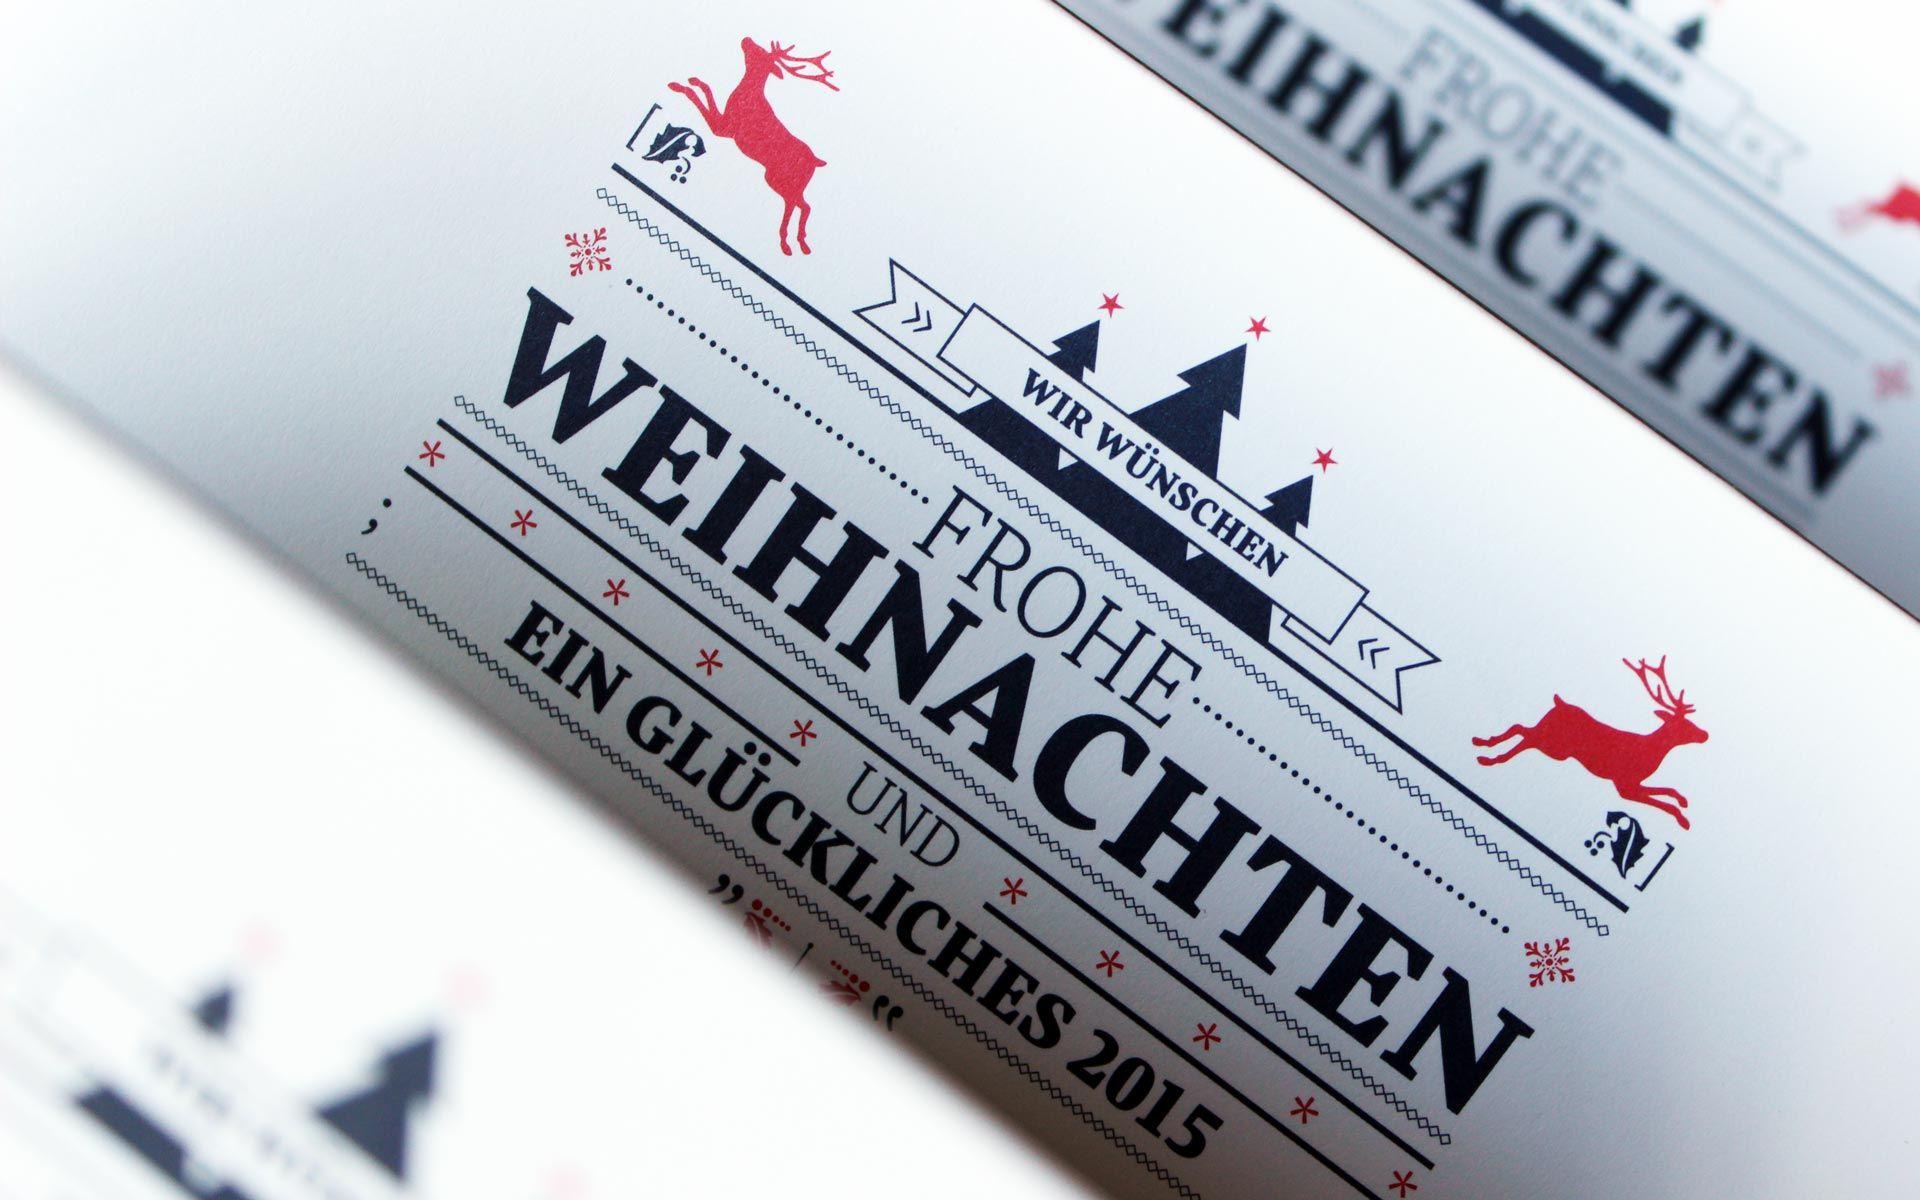 Dülberg & Brendel Corporate Design, Weihnachtskarte, Typografie